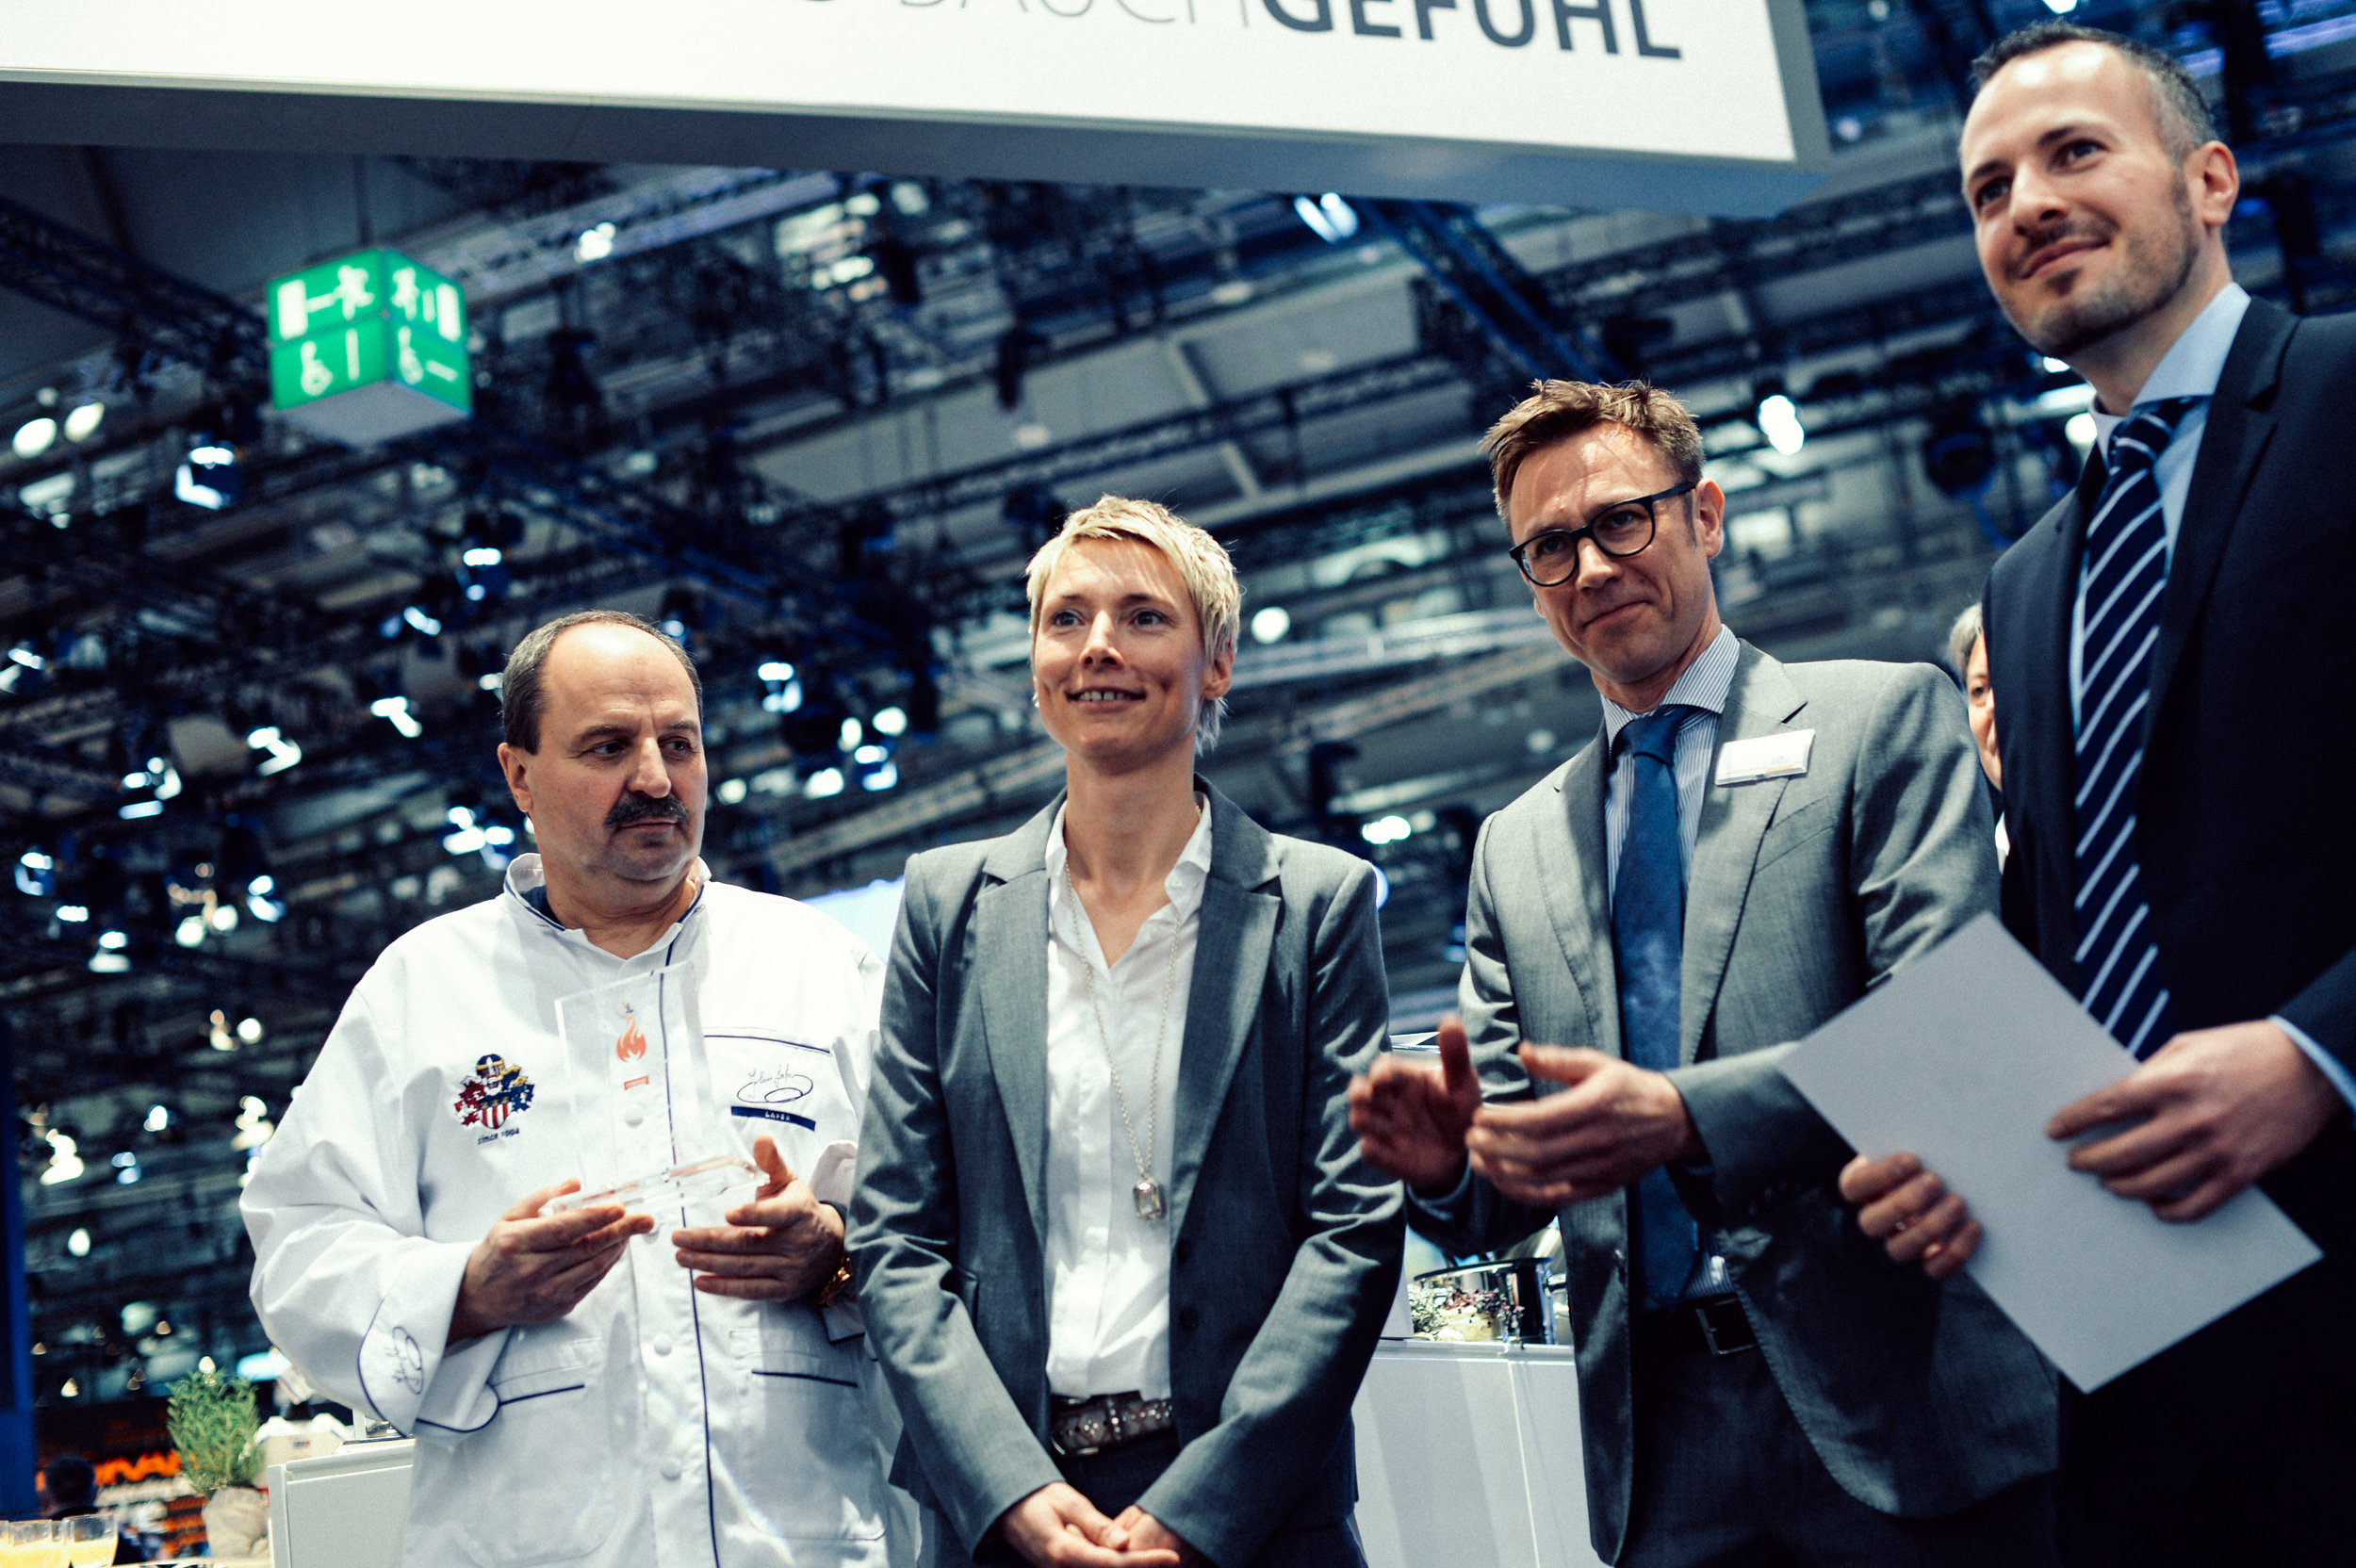 german_food_blog_contest-21.jpg